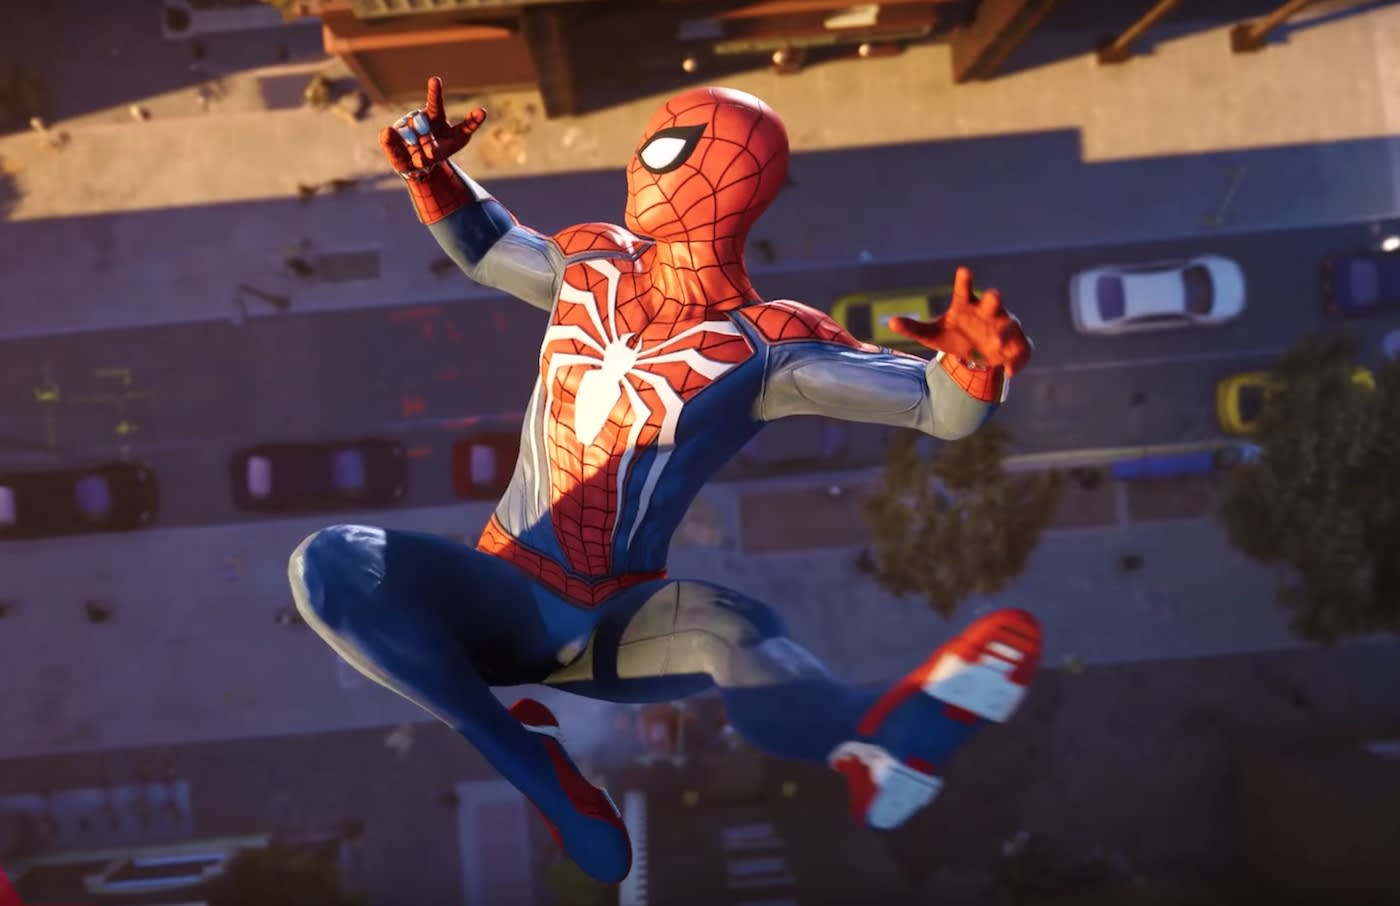 Spider-Man' arrives on PS4 September 7th